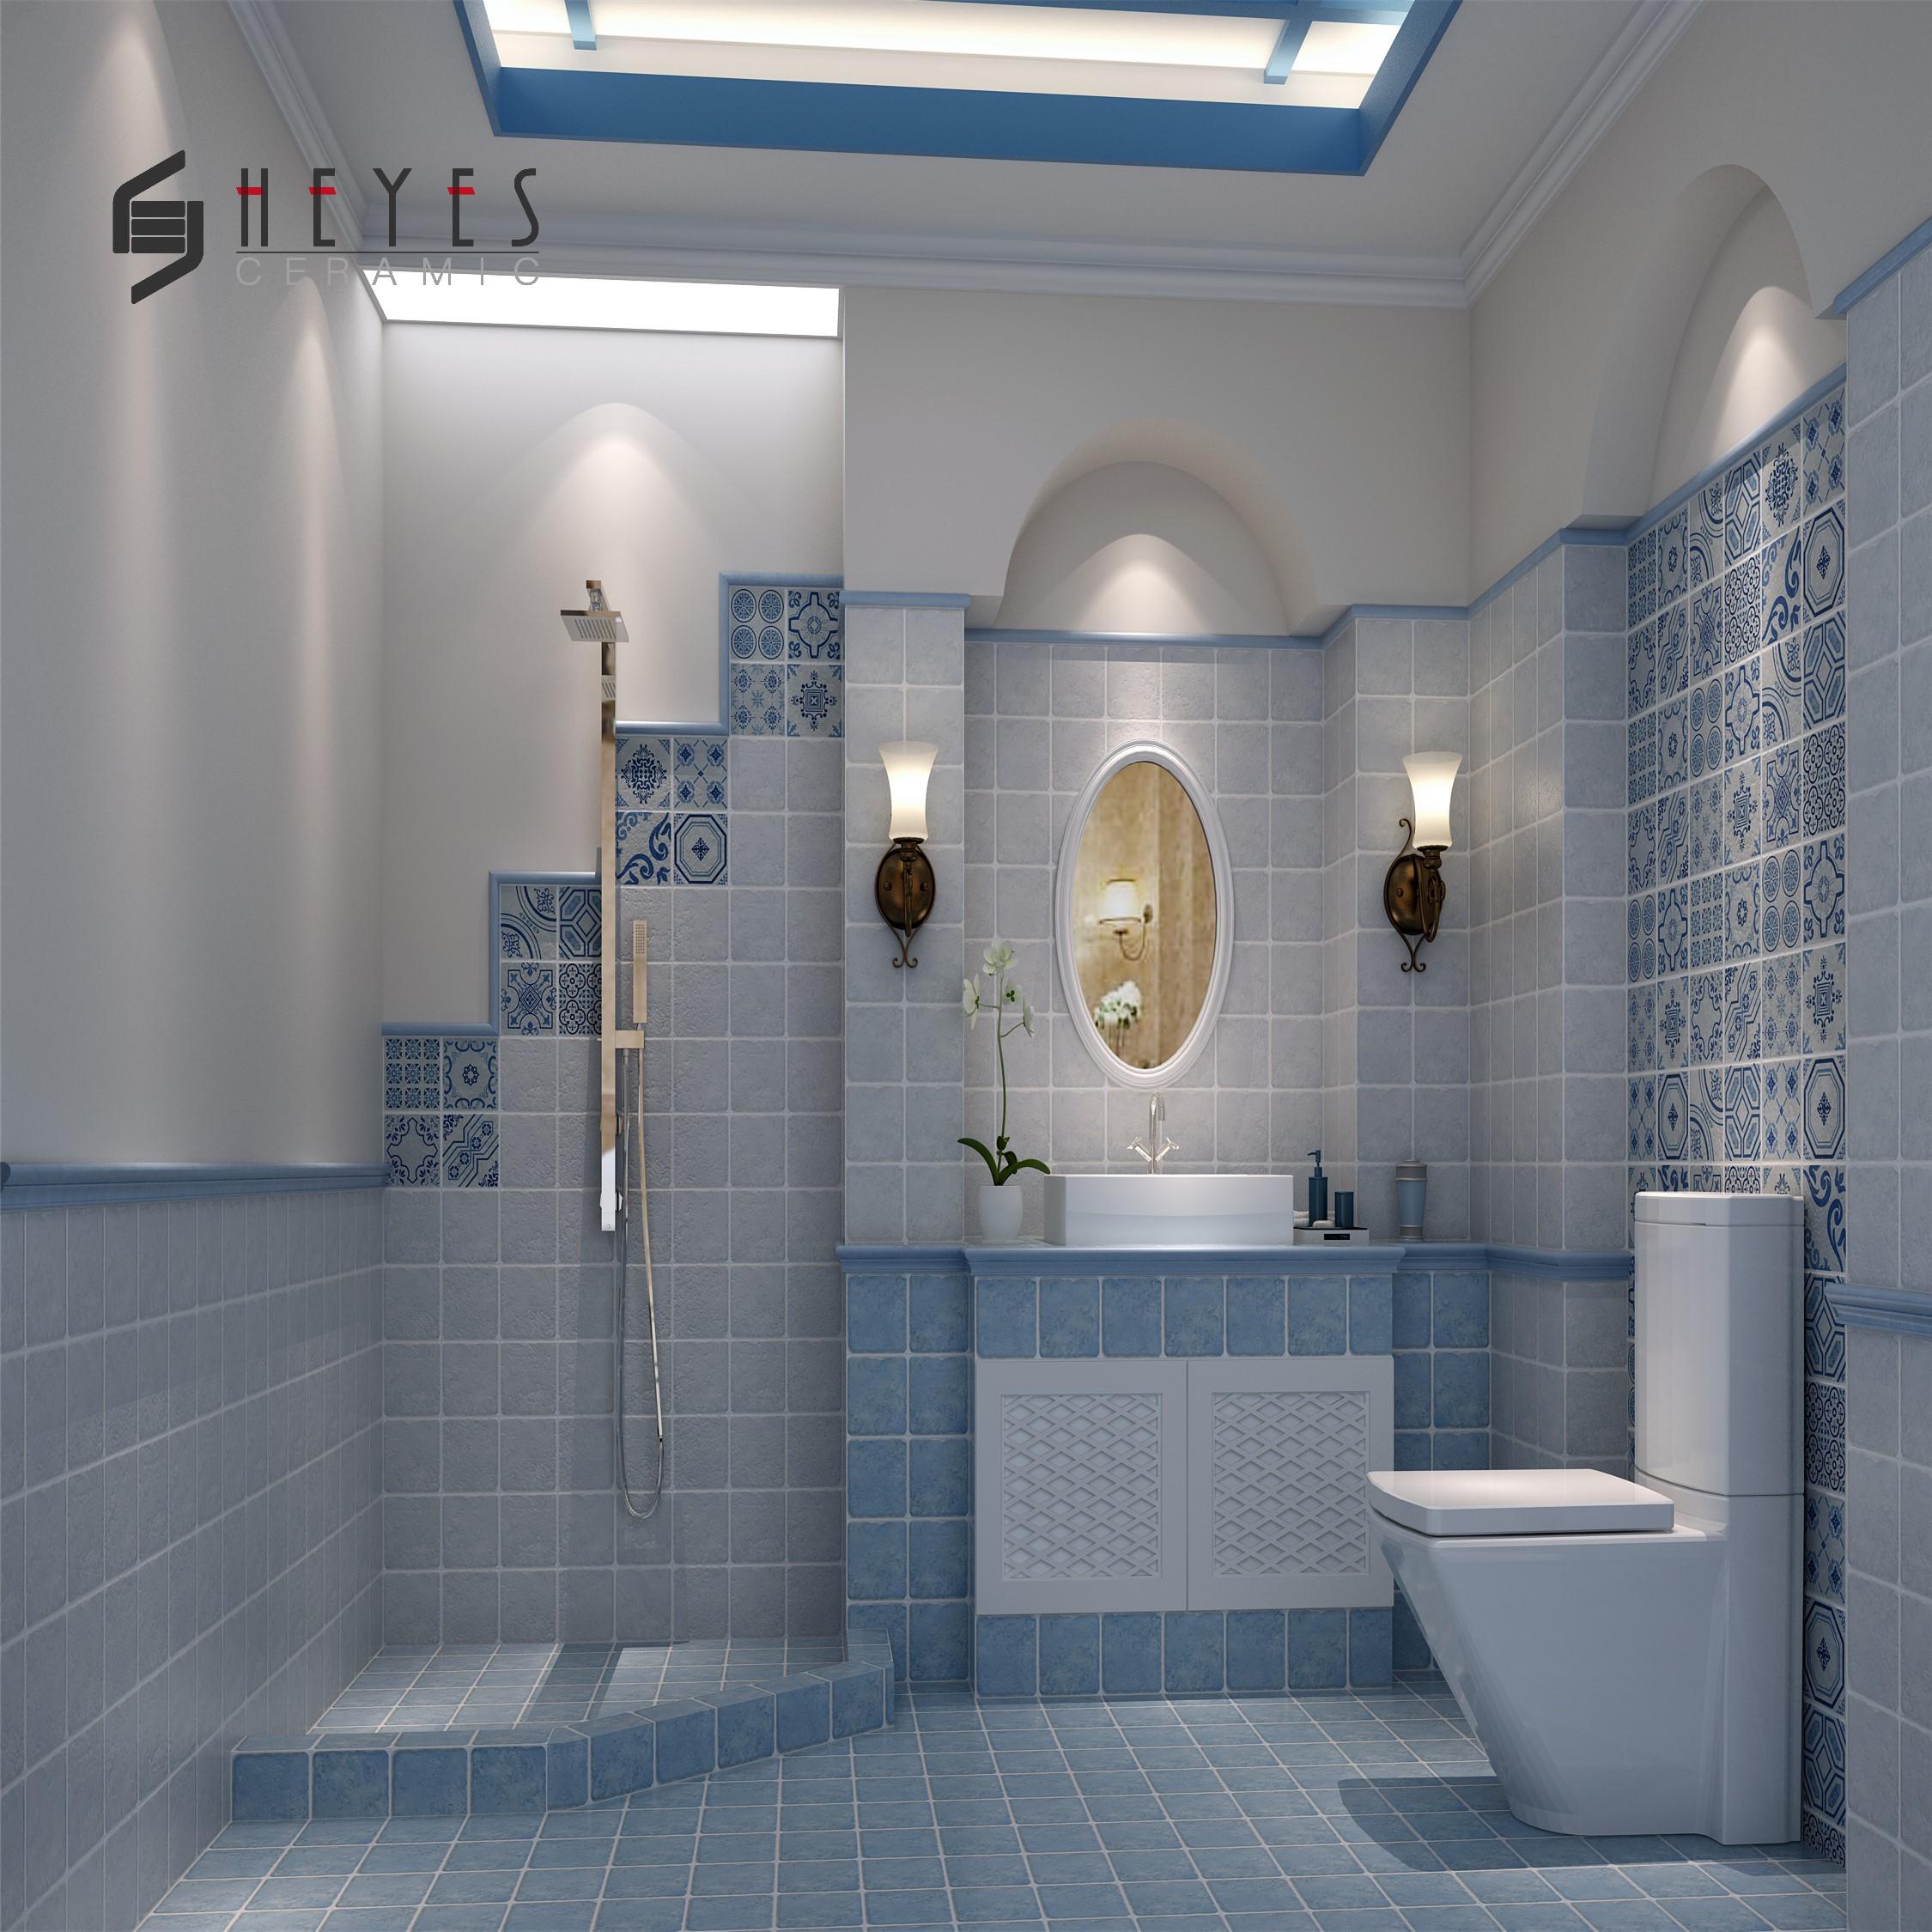 Blue Flower Ceramic Bathroom Floor Kitchen Wall Tiles Supplier Buy Bathroom Floor Tiles Ceramic Floor Tiles Wall Flower Tiles Kitchen Product On Alibaba Com